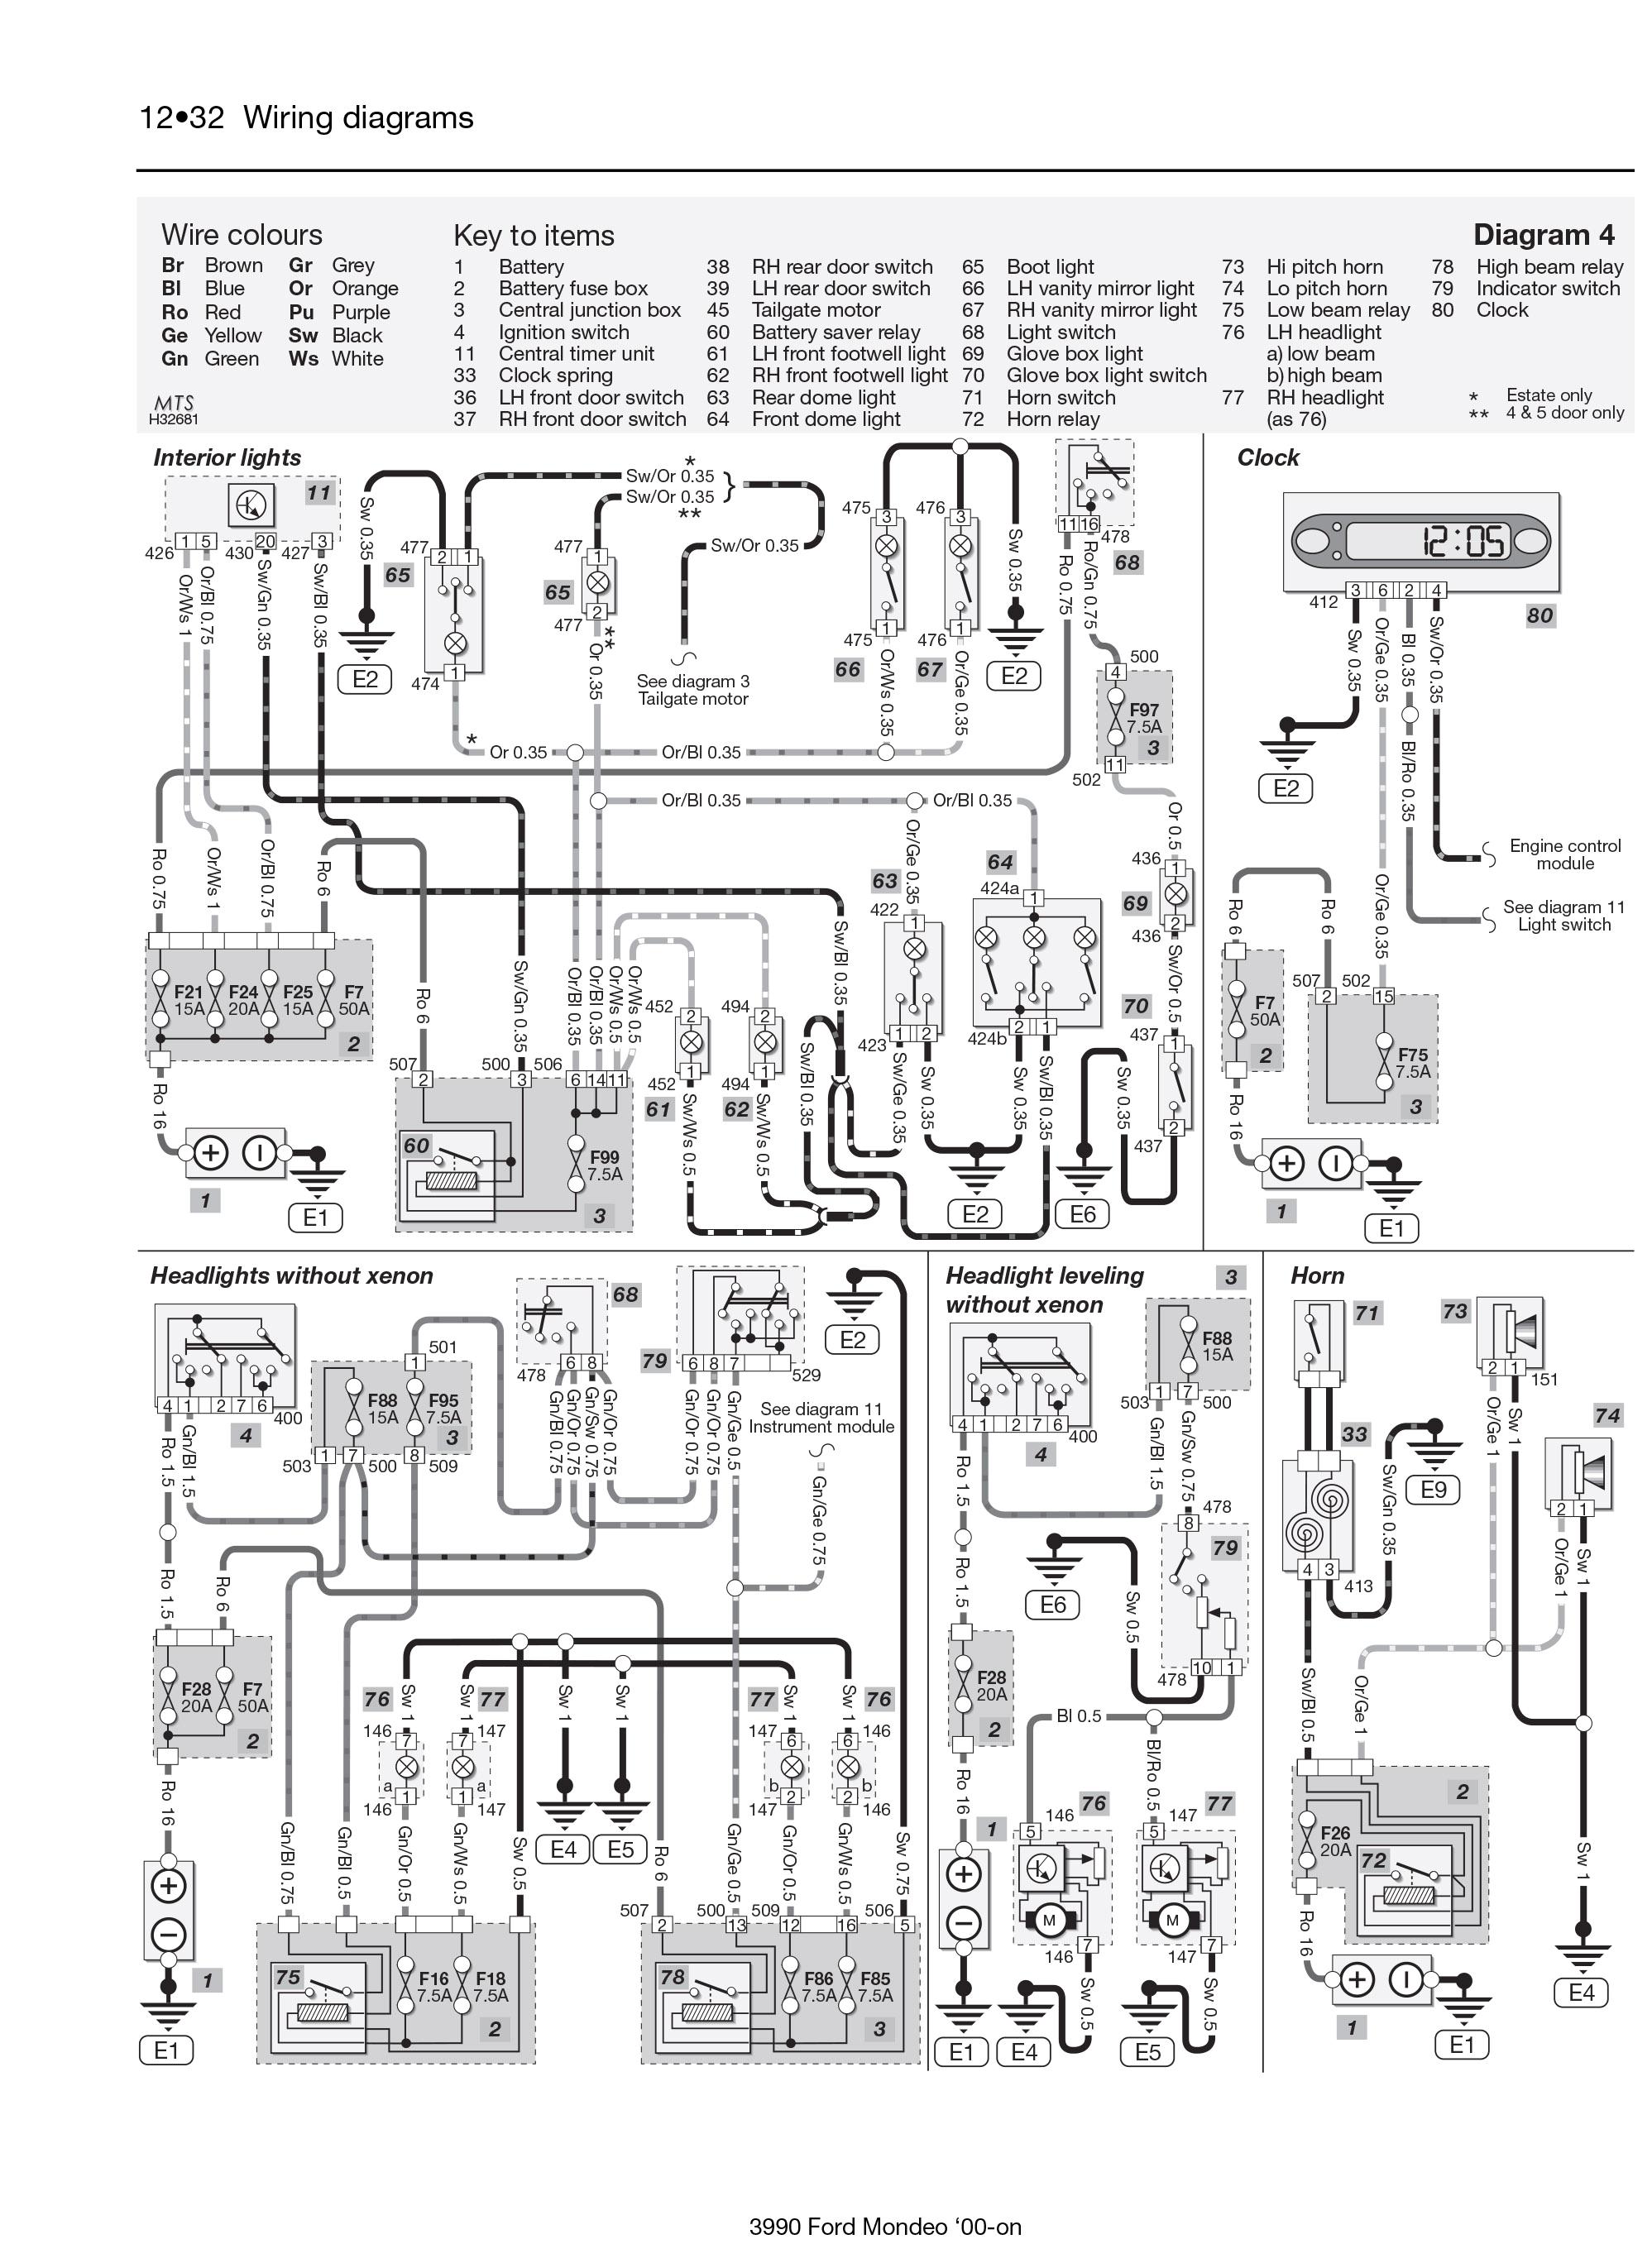 Mk4 Wiring Diagram ford Mondeo Wiring Diagram Wiring Library